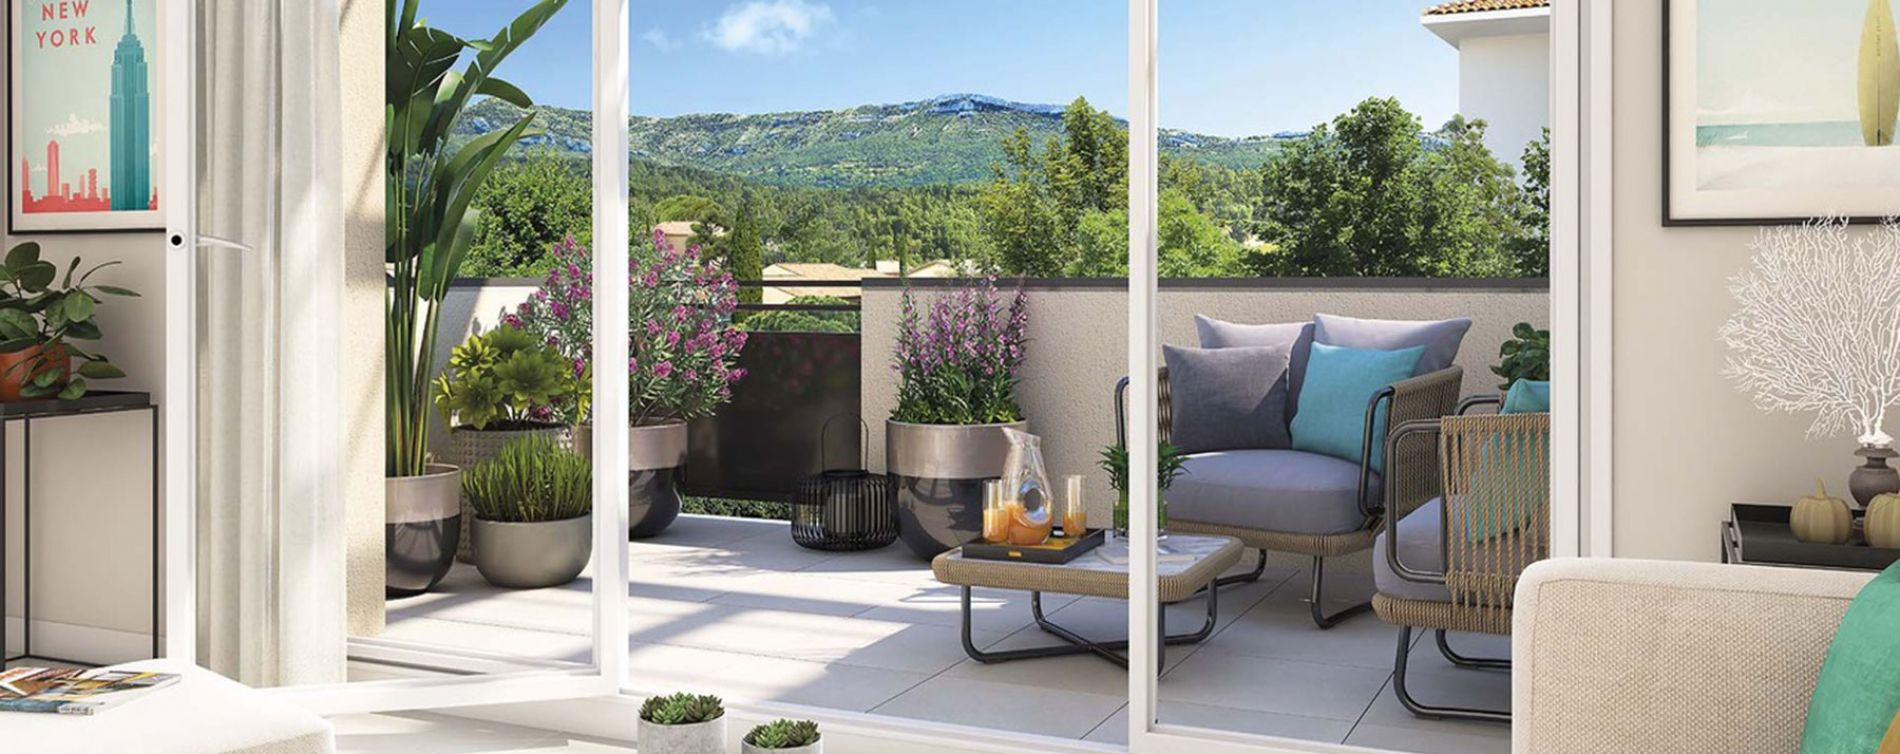 Gardanne : programme immobilier neuve « Harmonie Provence » (3)